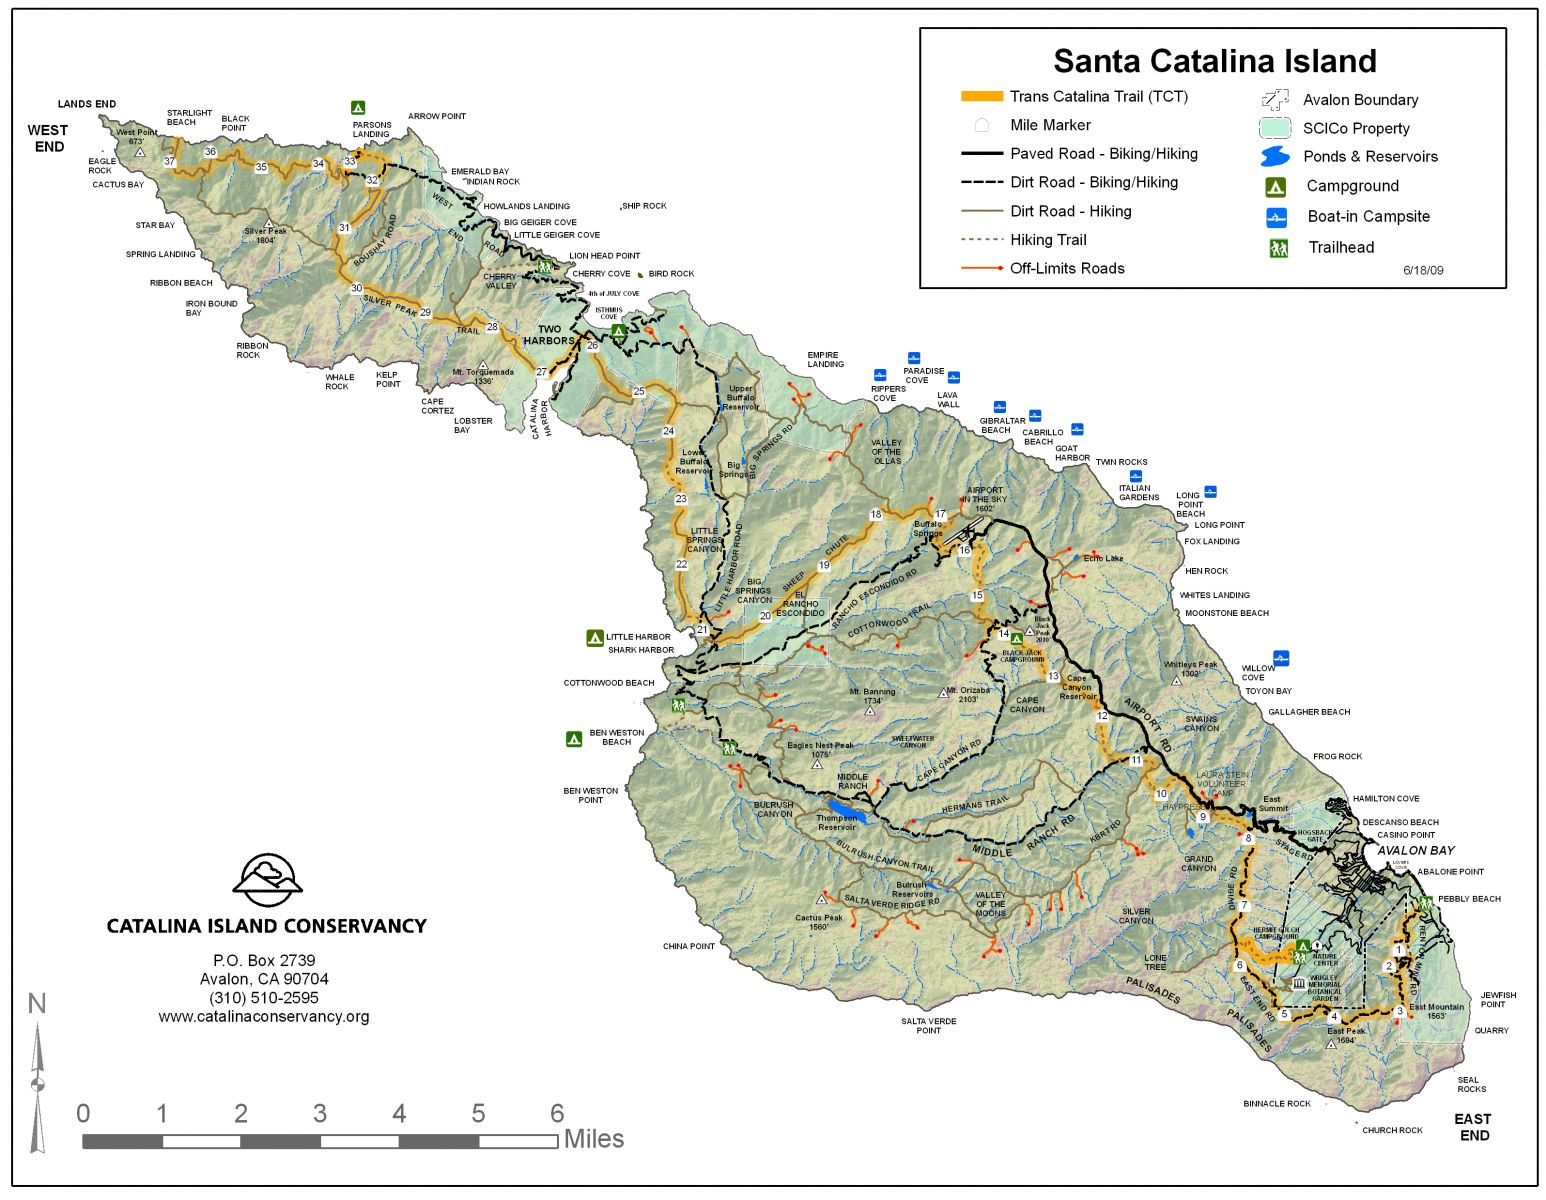 trans catalina trail map